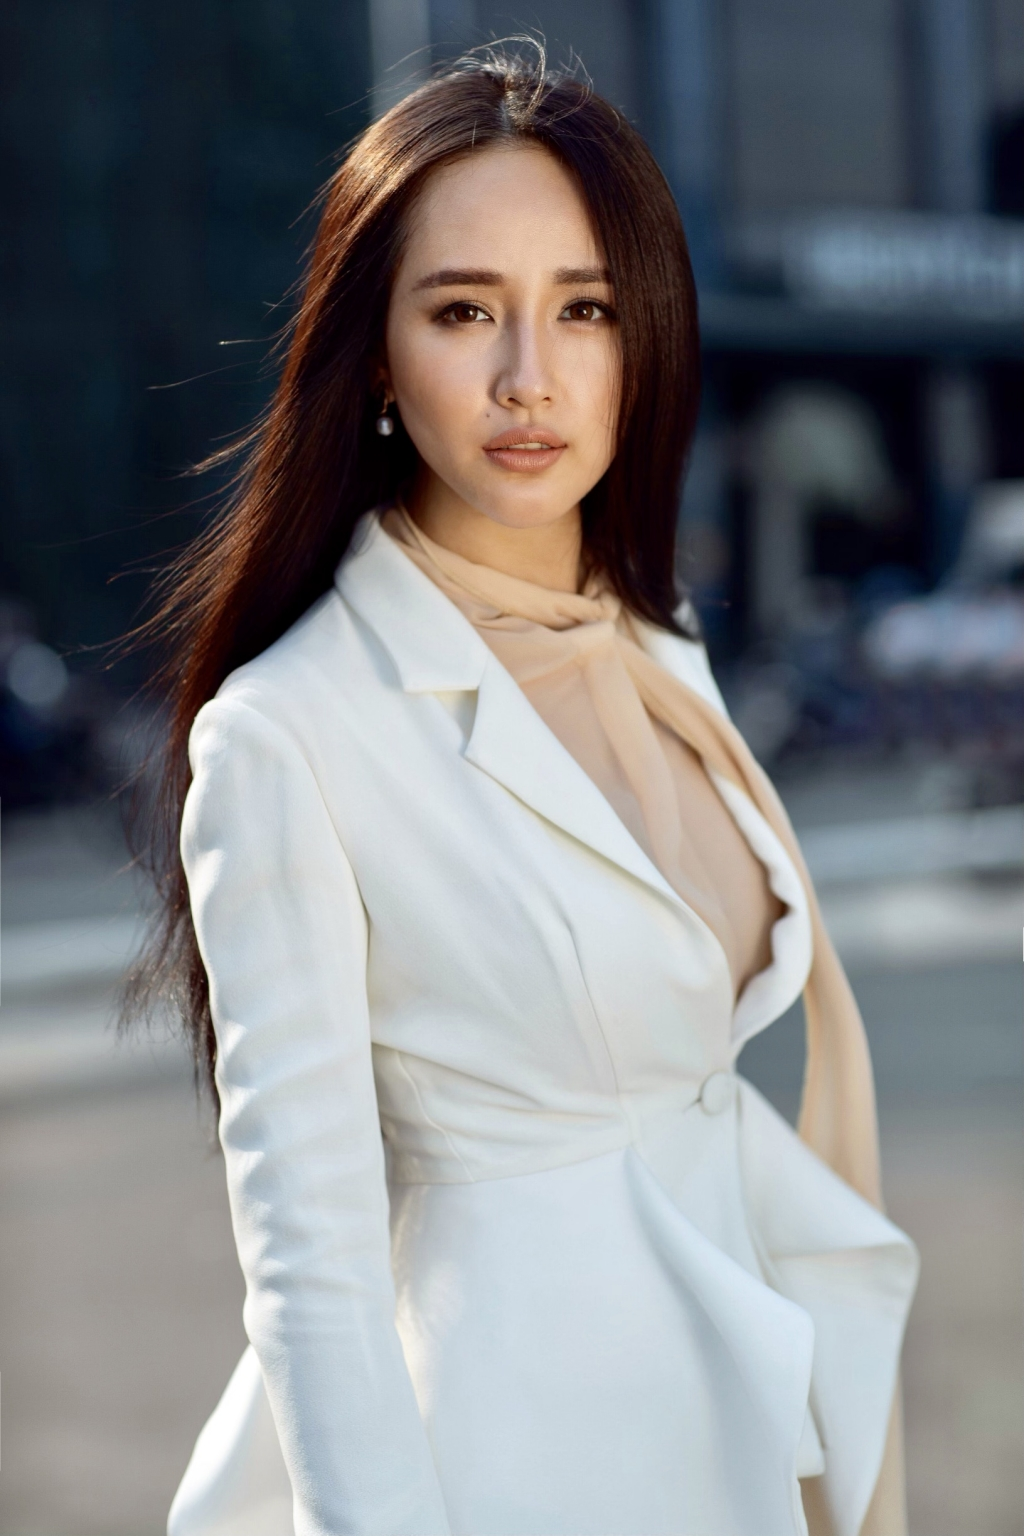 hoa hau mai phuong thuy chinh thuc tro thanh thanh vien ban giam khao miss world viet nam 2019